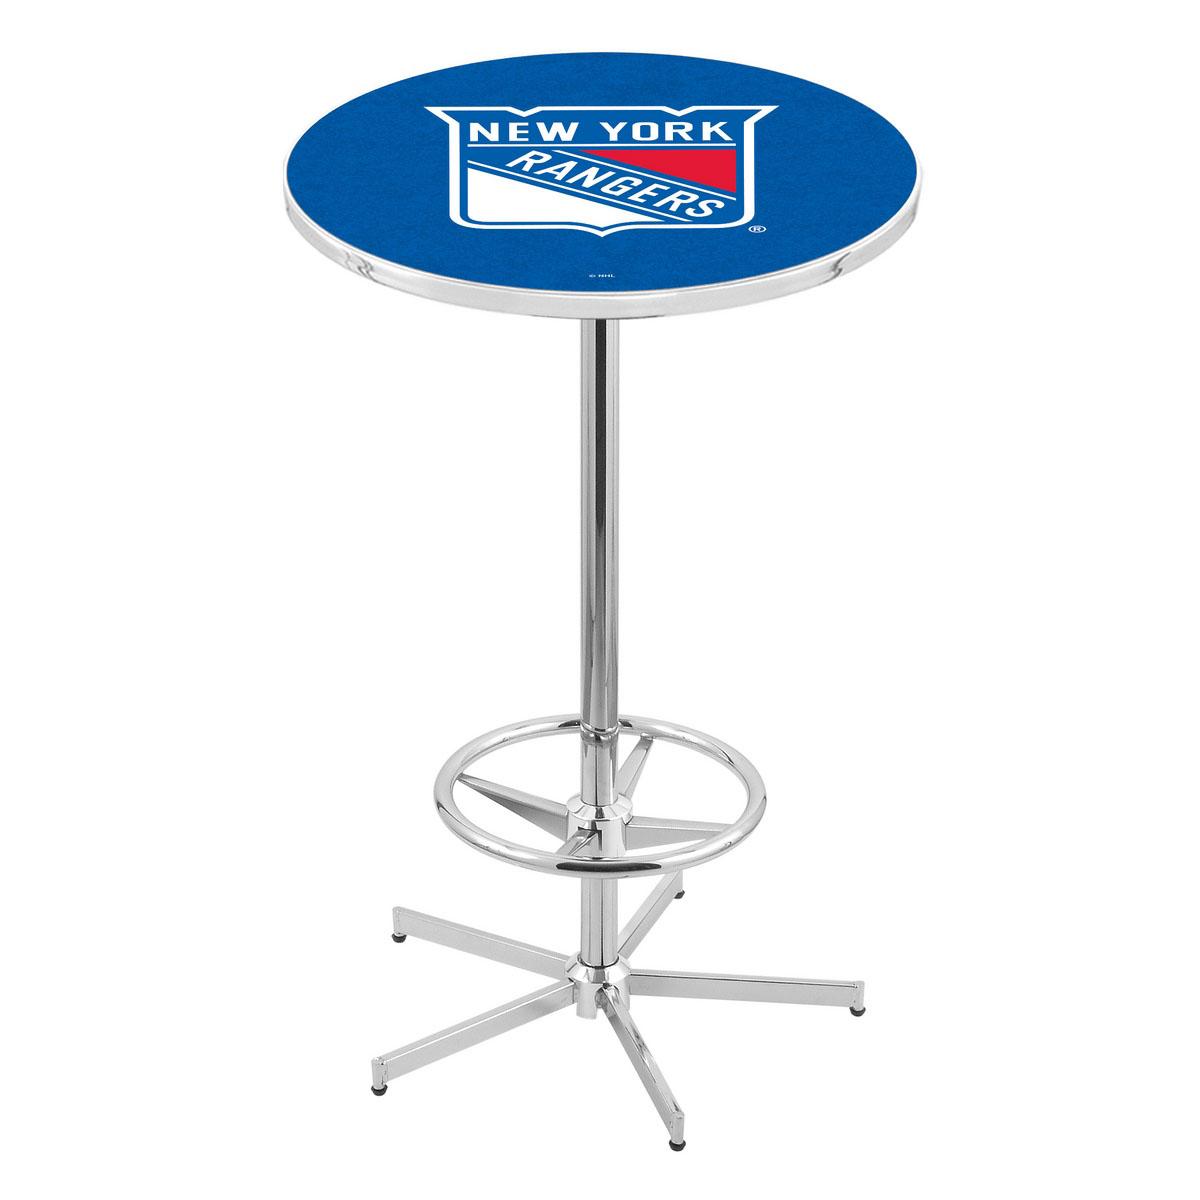 Choose Chrome-York-Rangers-Pub-Table Product Image 2123